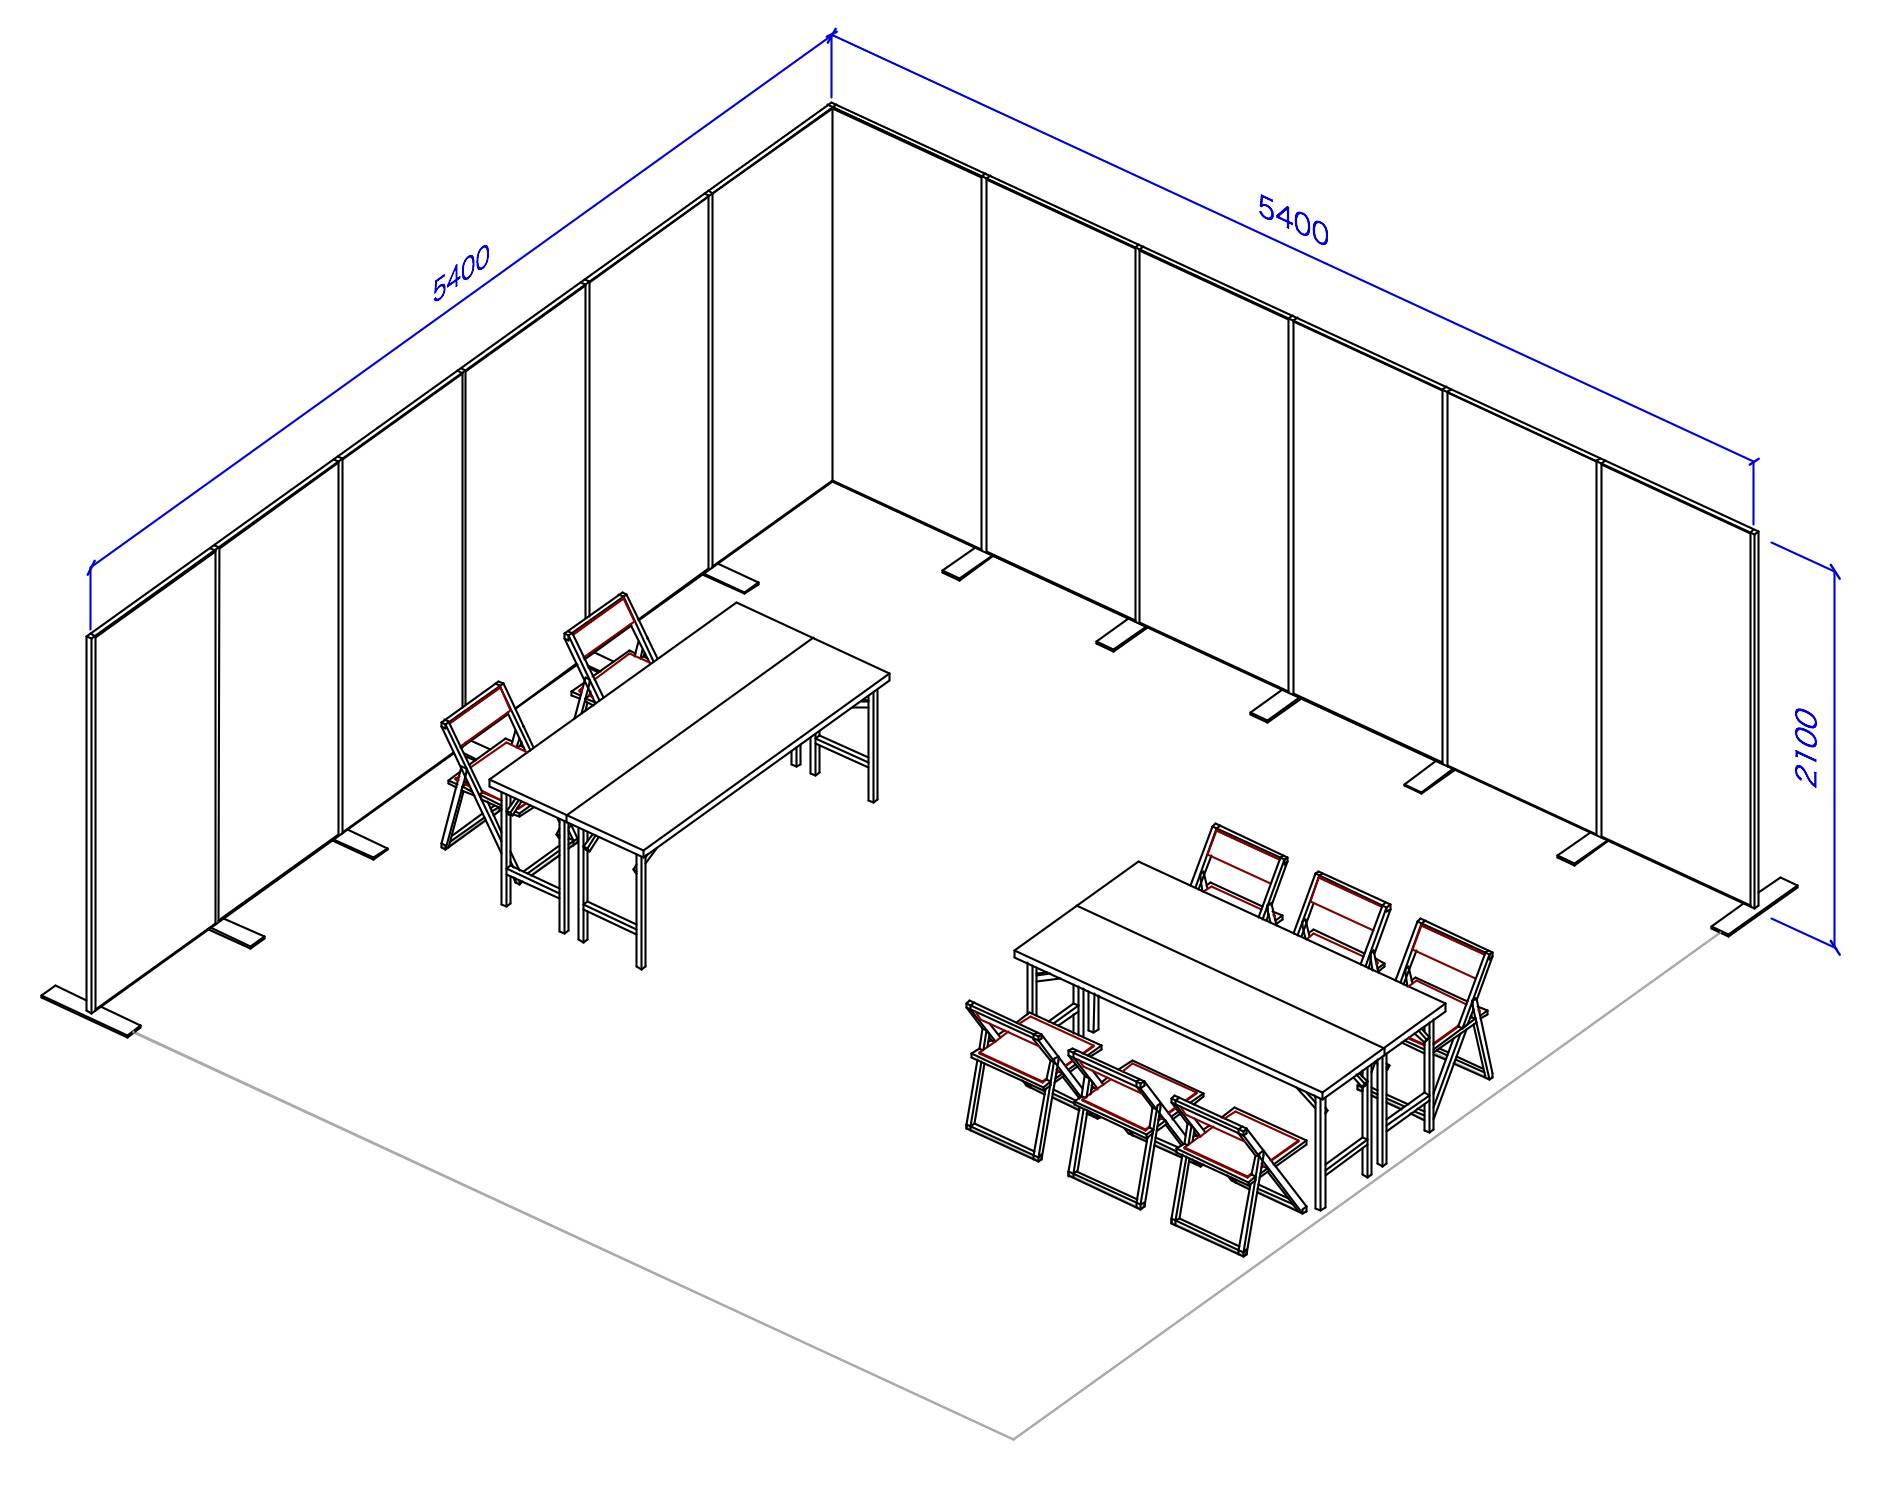 D1 販売スペース1 試遊スペース1